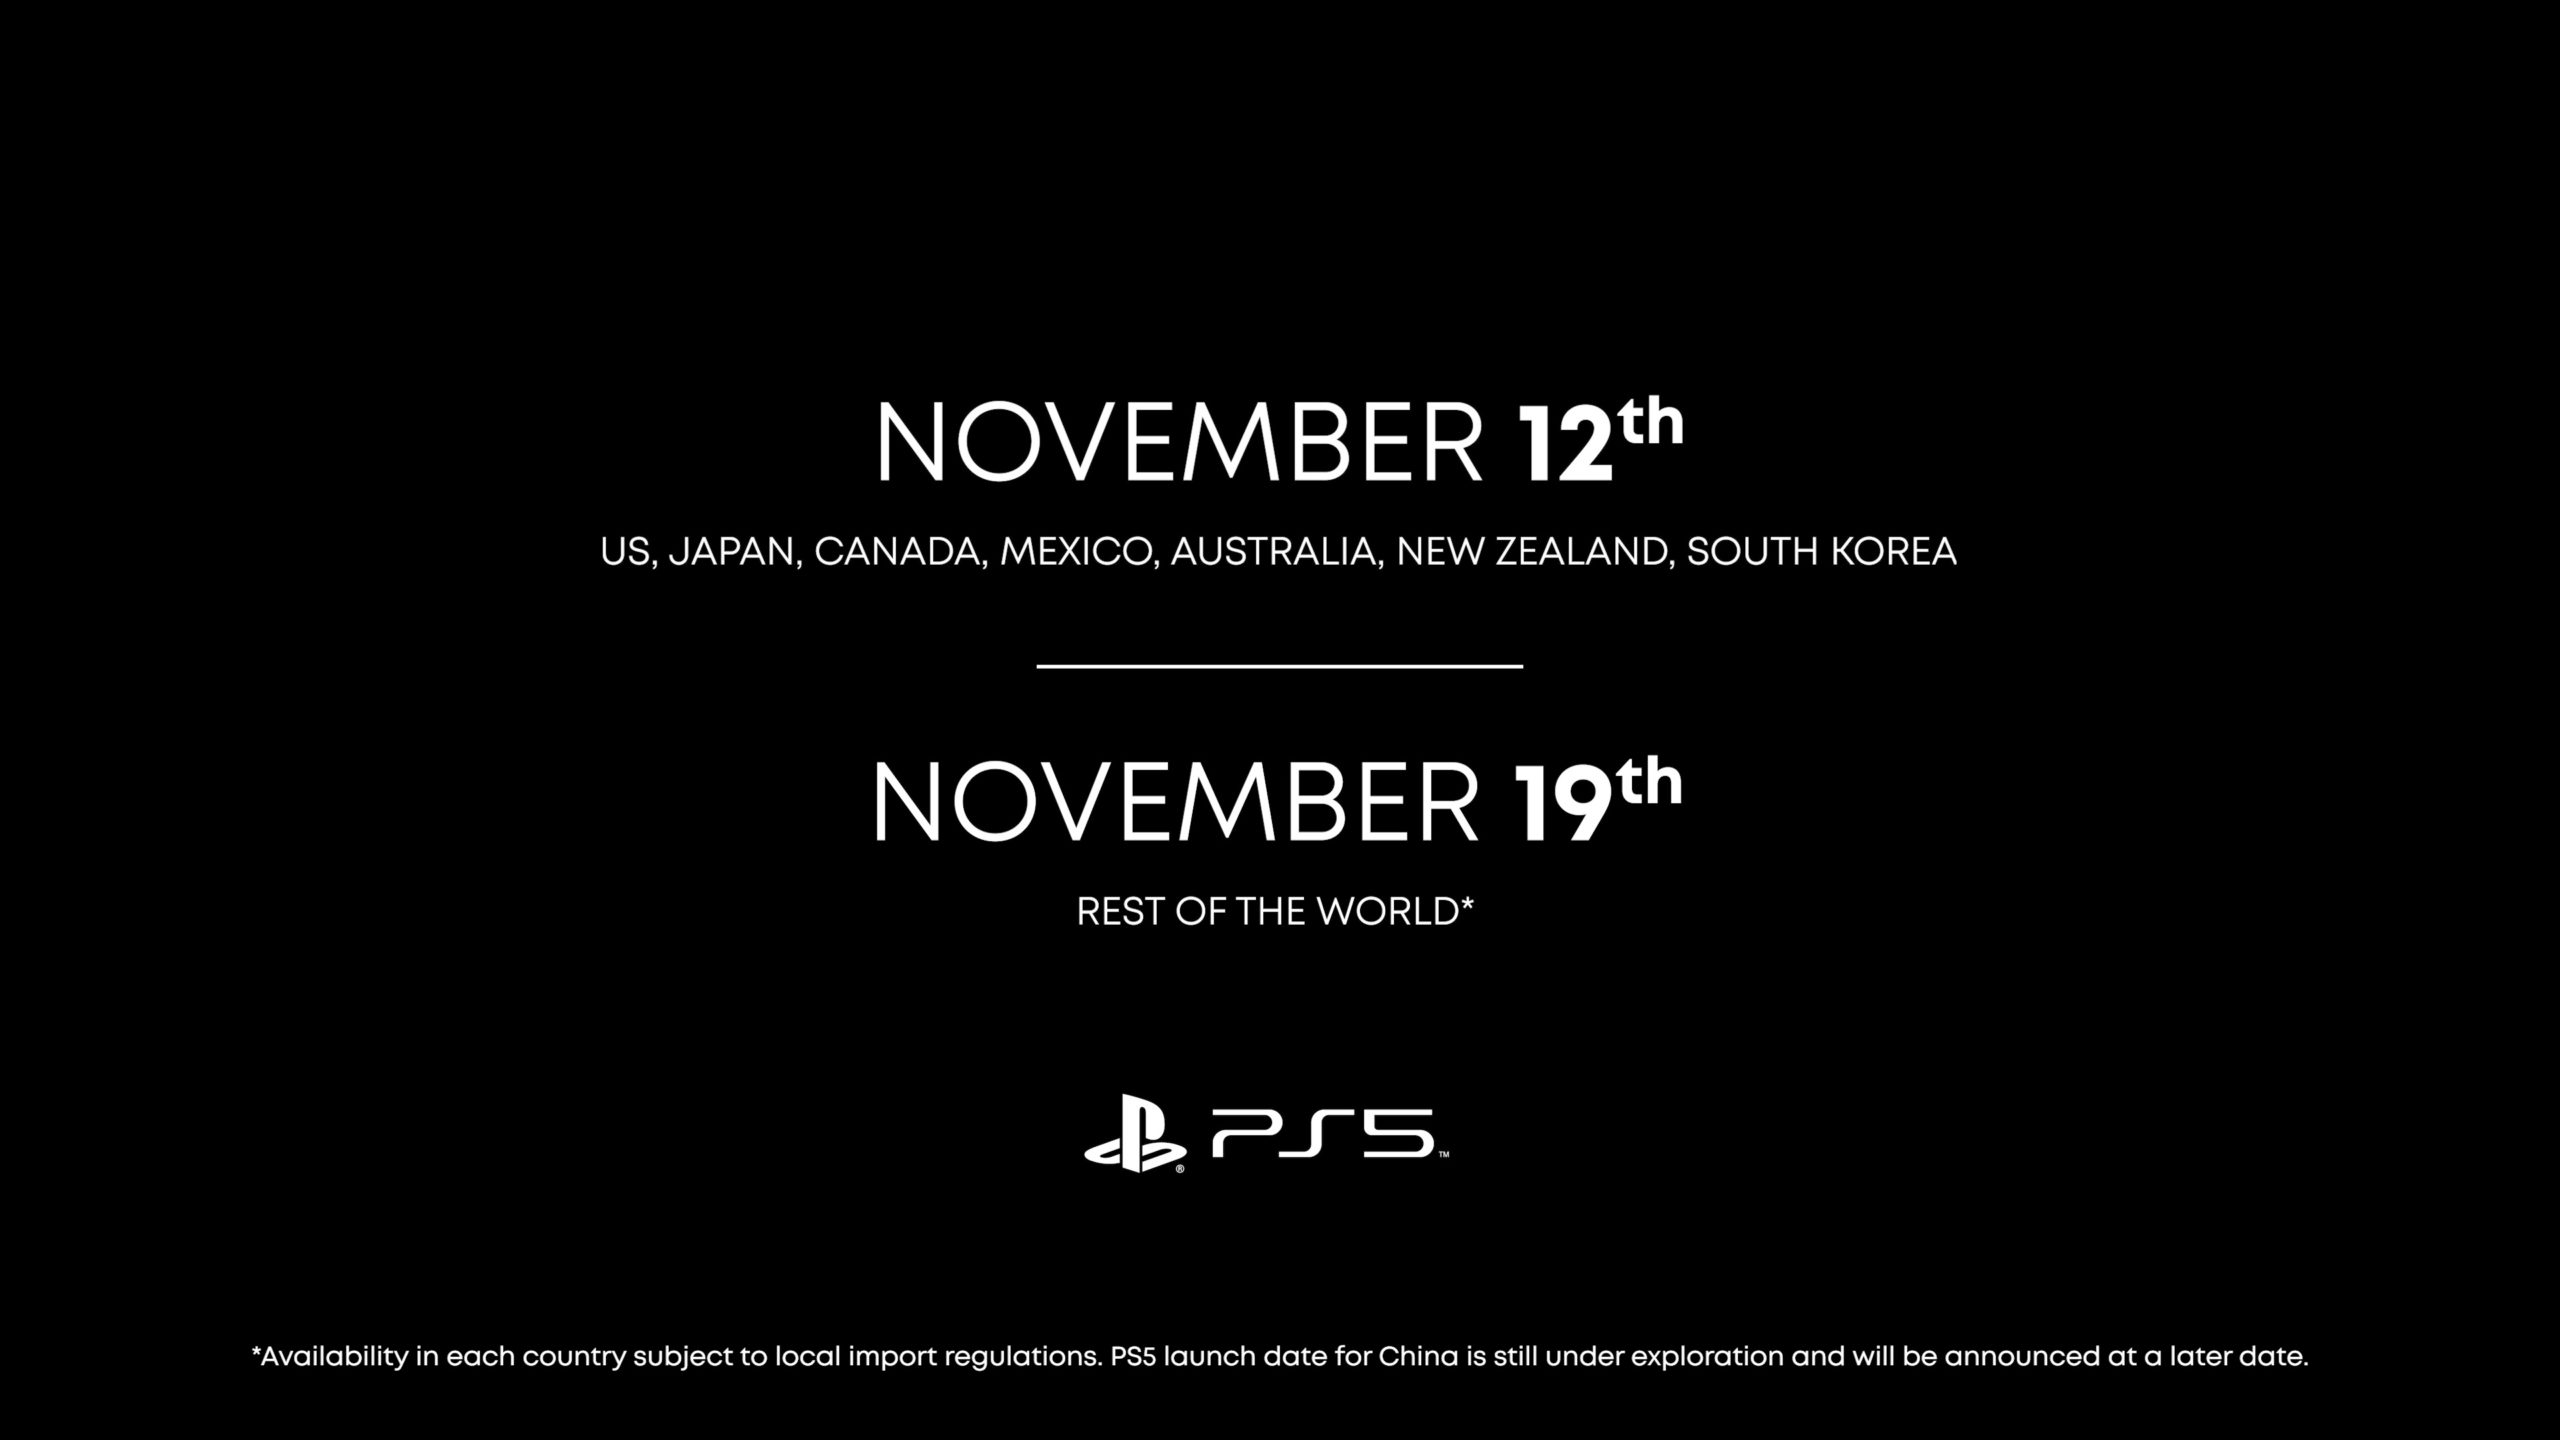 nuova UI PS5 PC